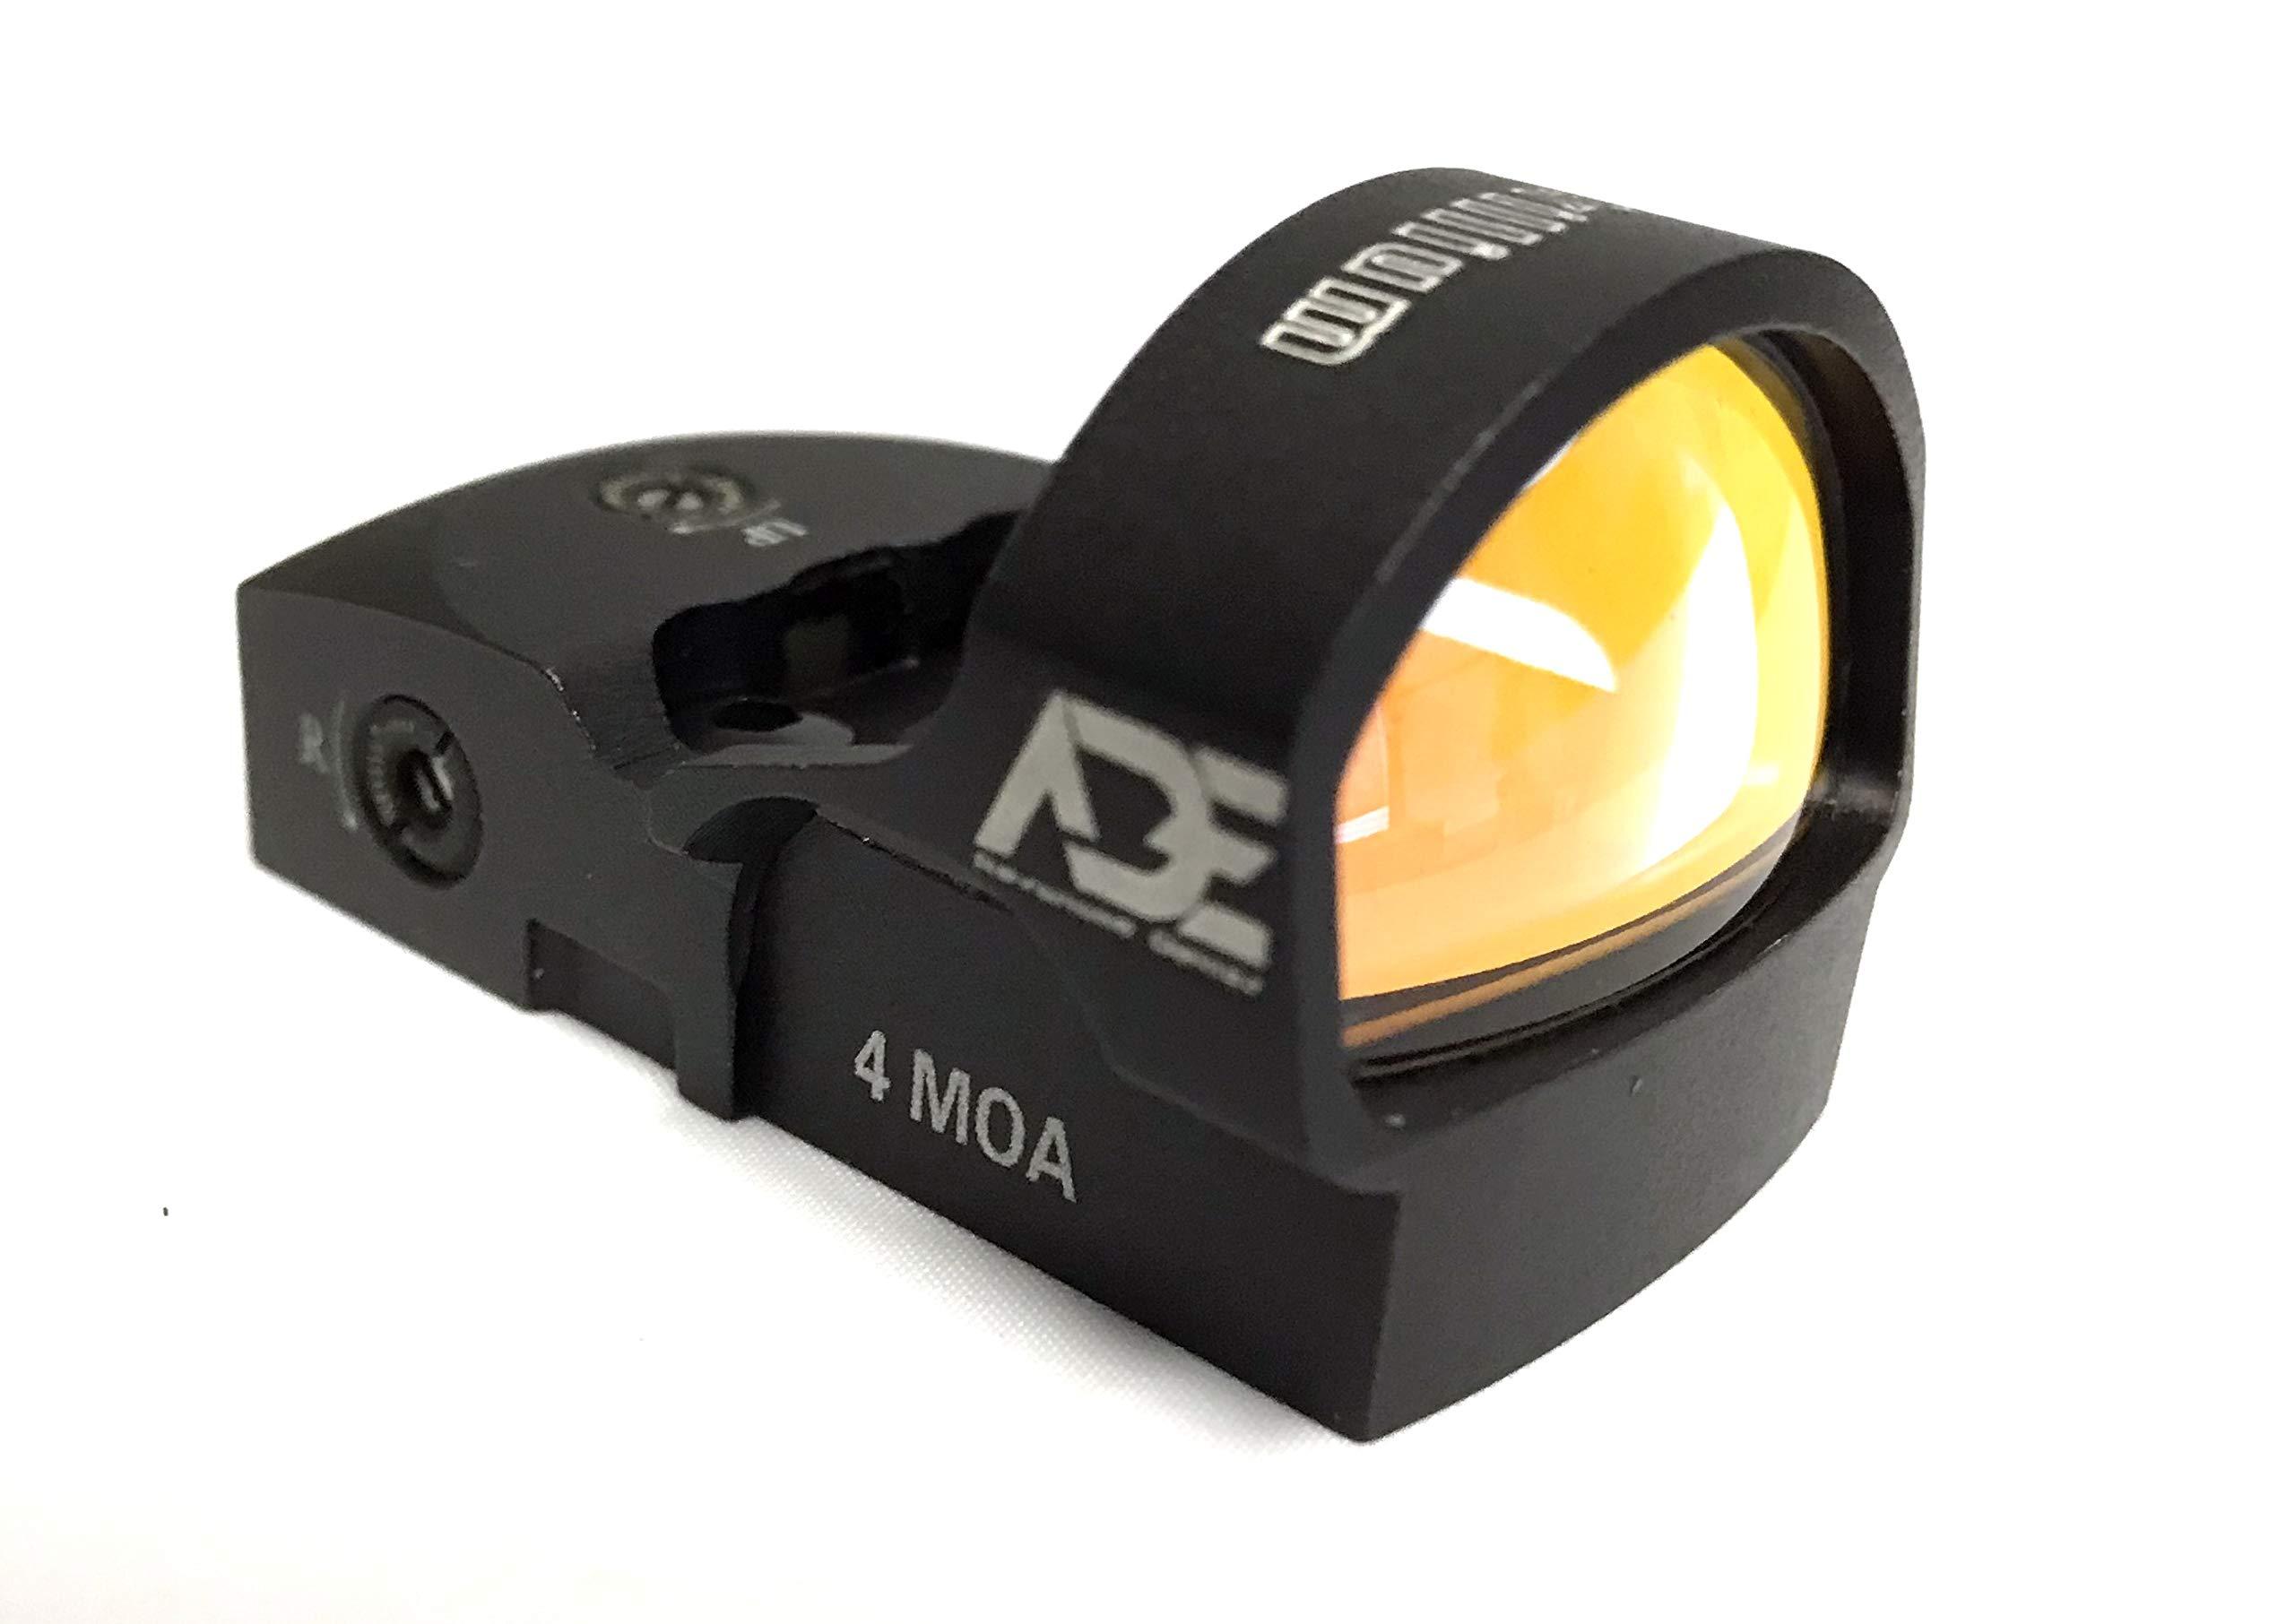 Ade Advanced Optics Bertrillium RD3-013 Red Dot Reflex Sight for Glock by Ade Advanced Optics